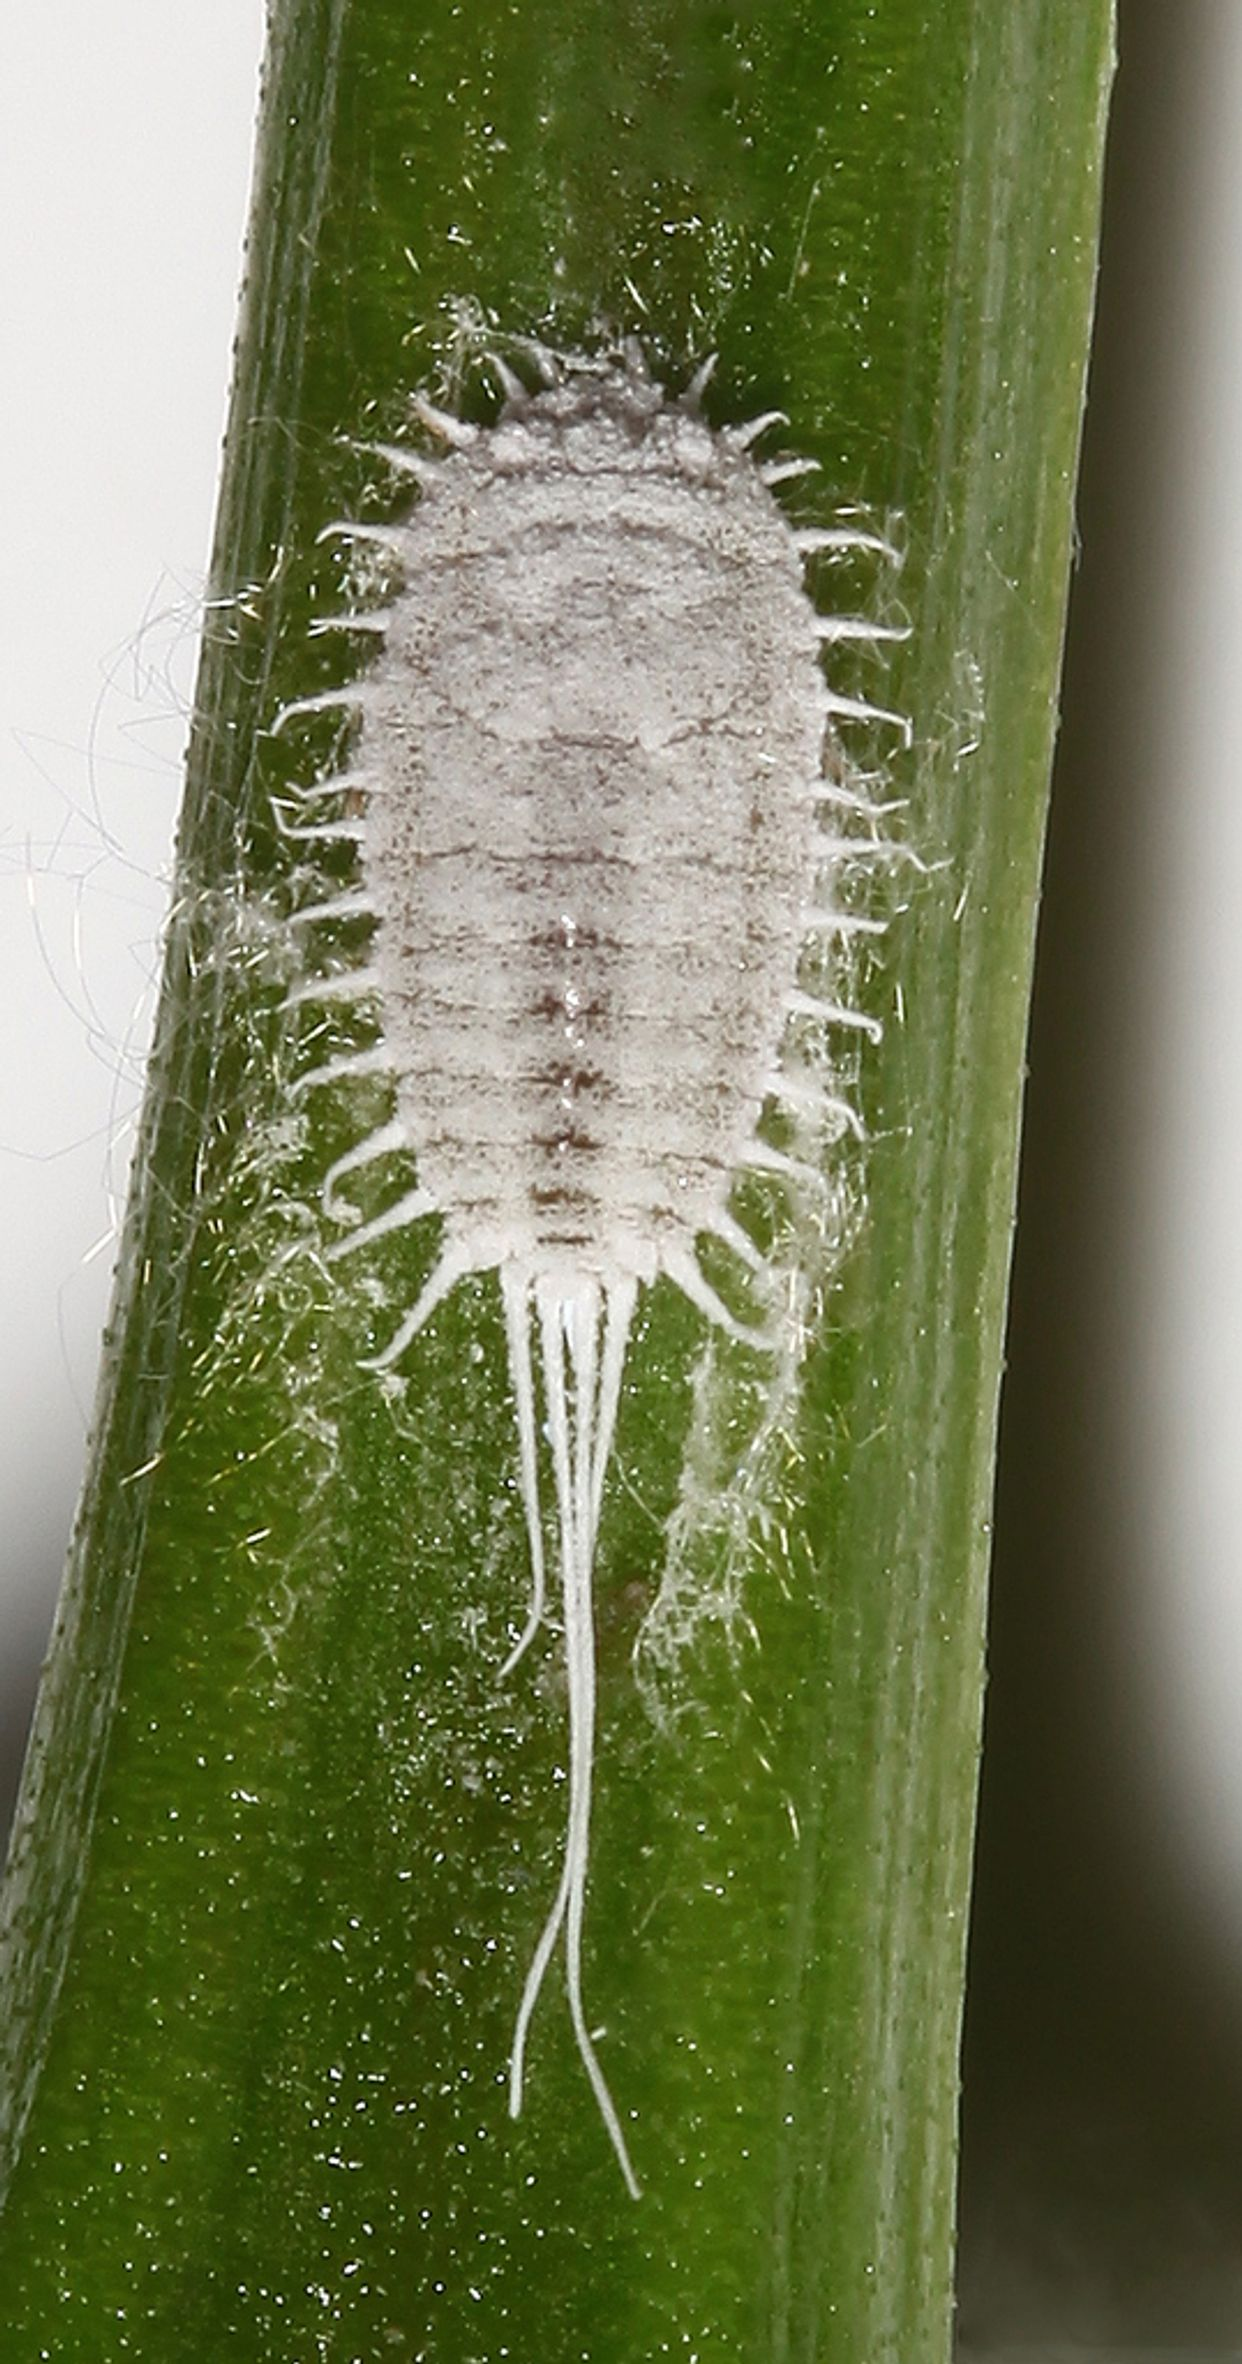 Pseudococcidae